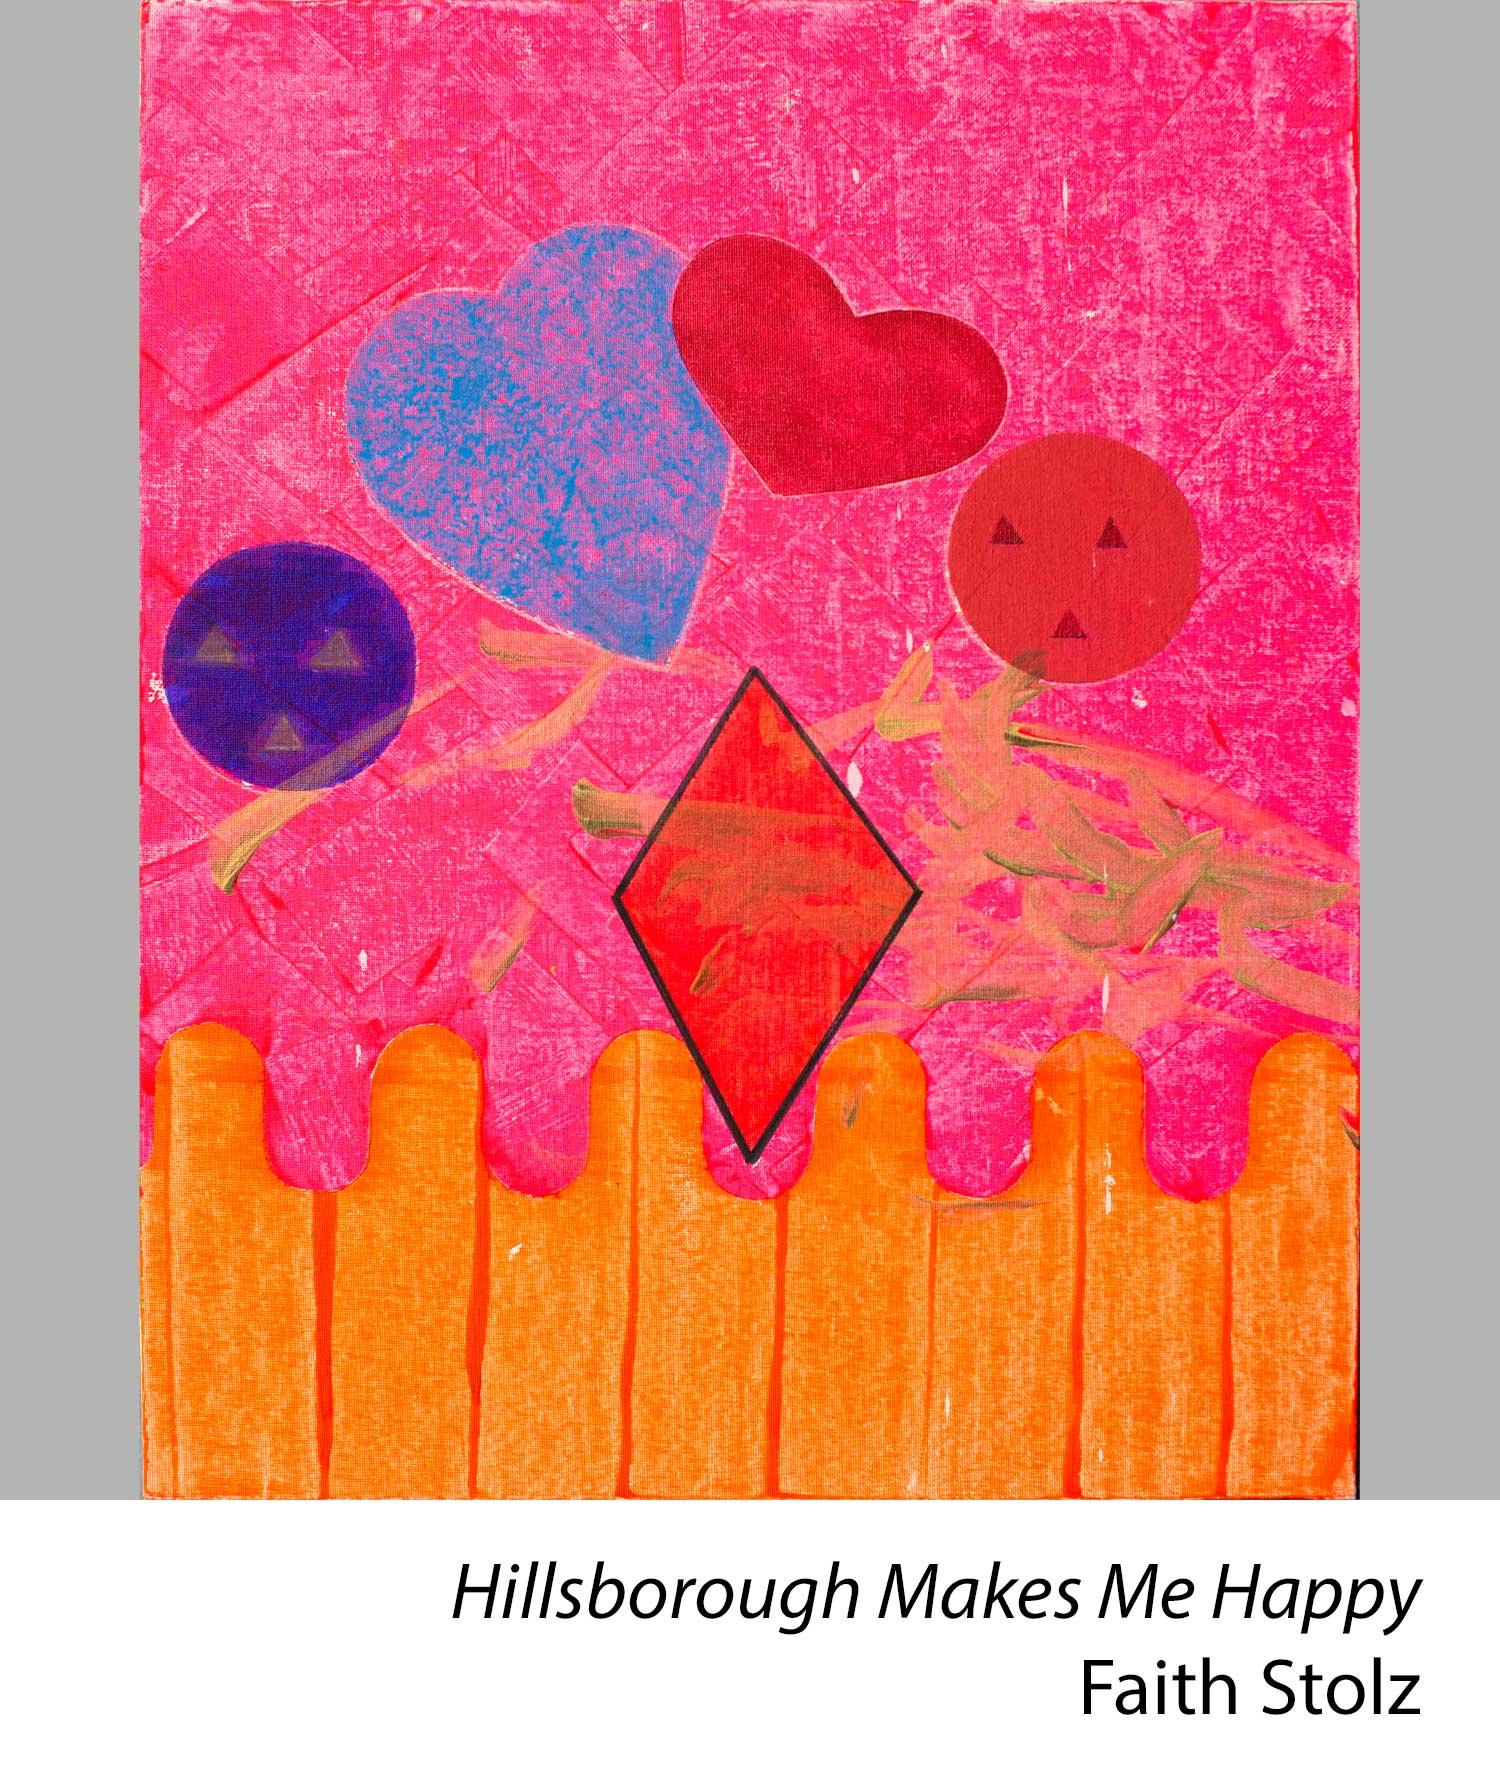 Hillsborough Makes Me Happy by Faith Stolz